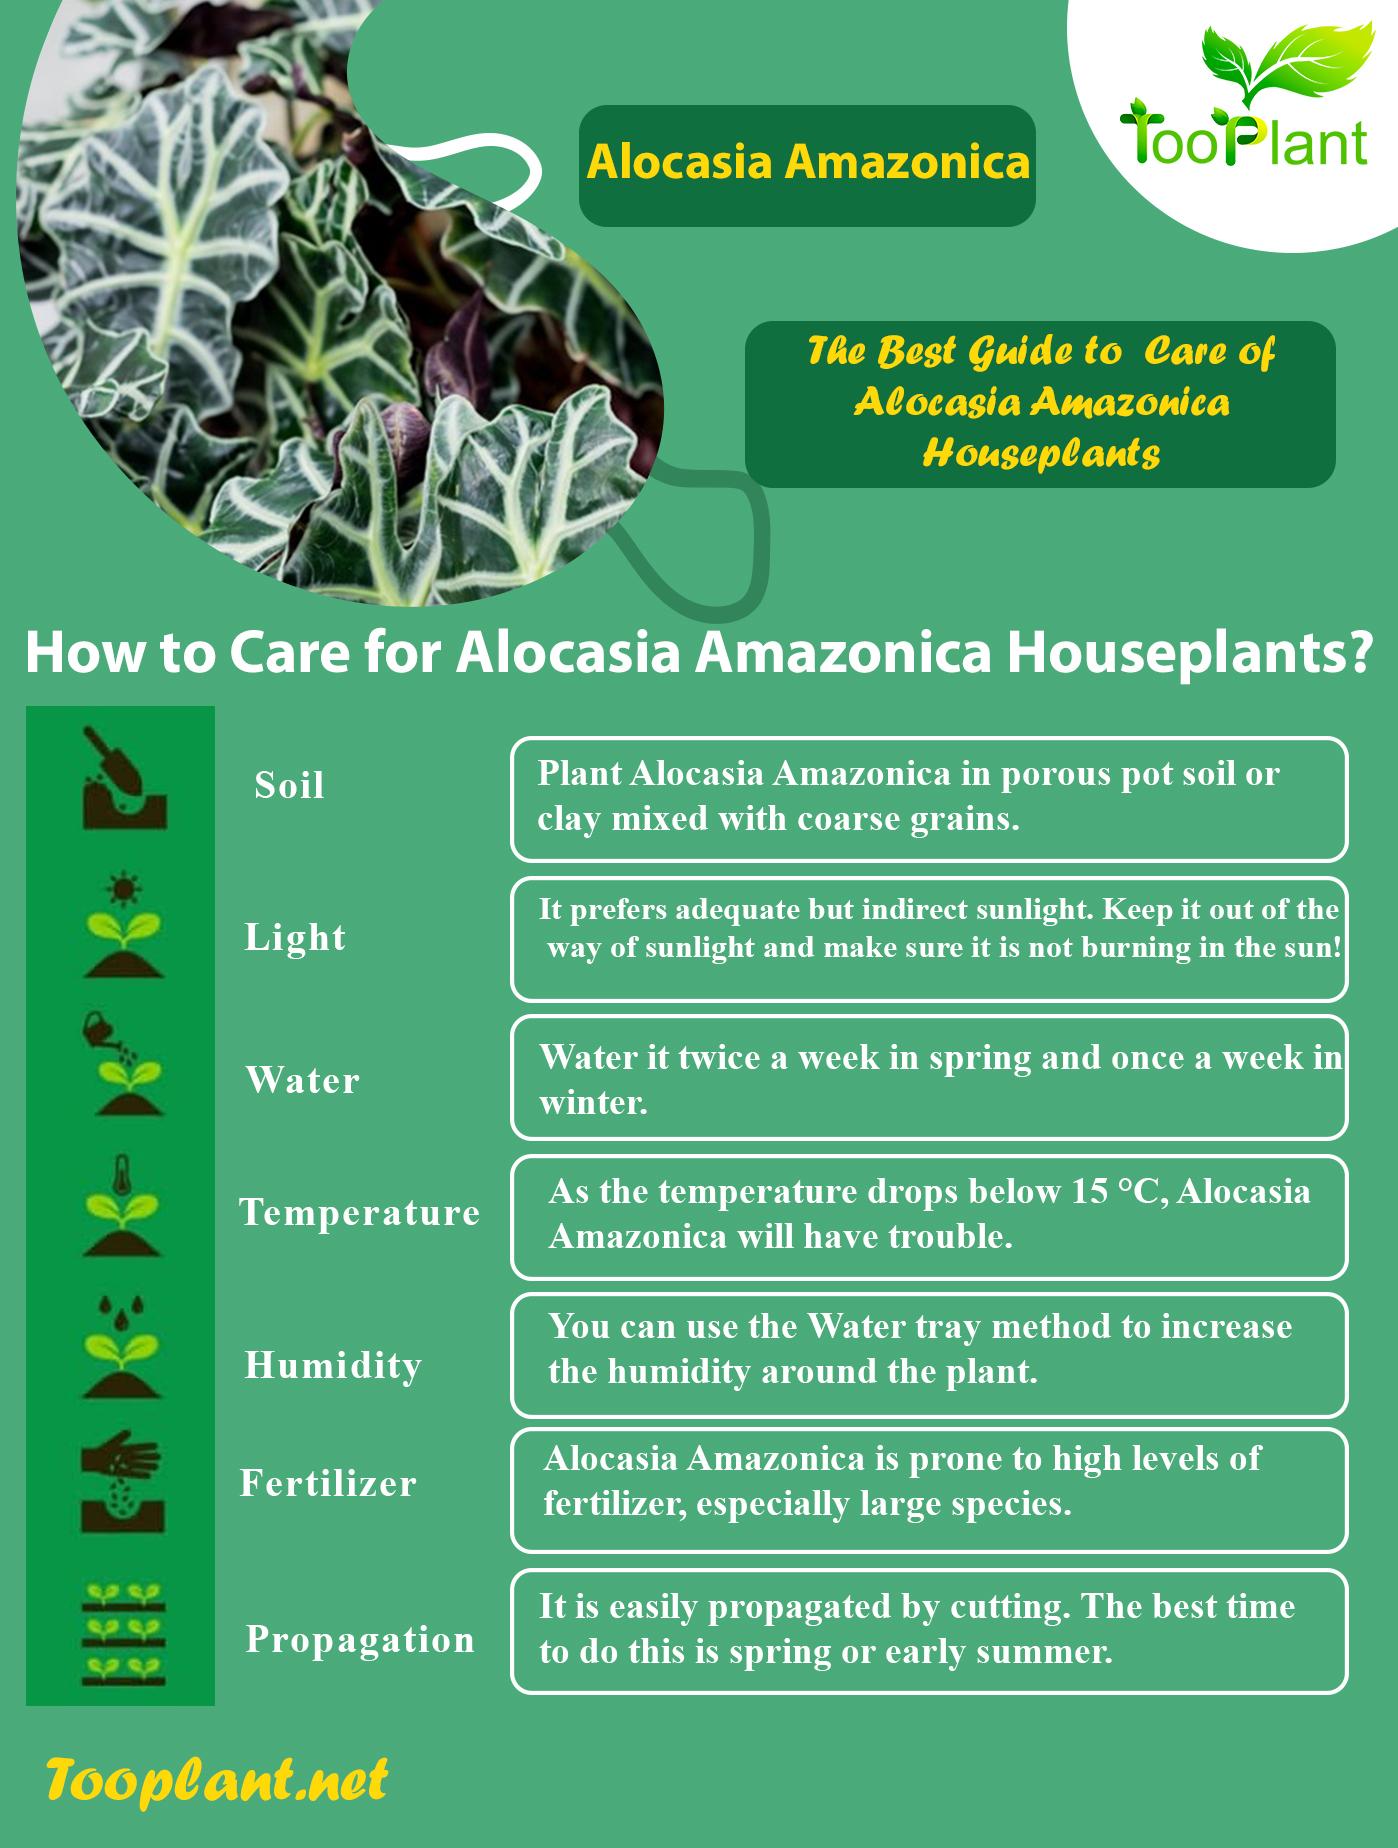 Infographic of Care for Alocasia Amazonica Houseplants